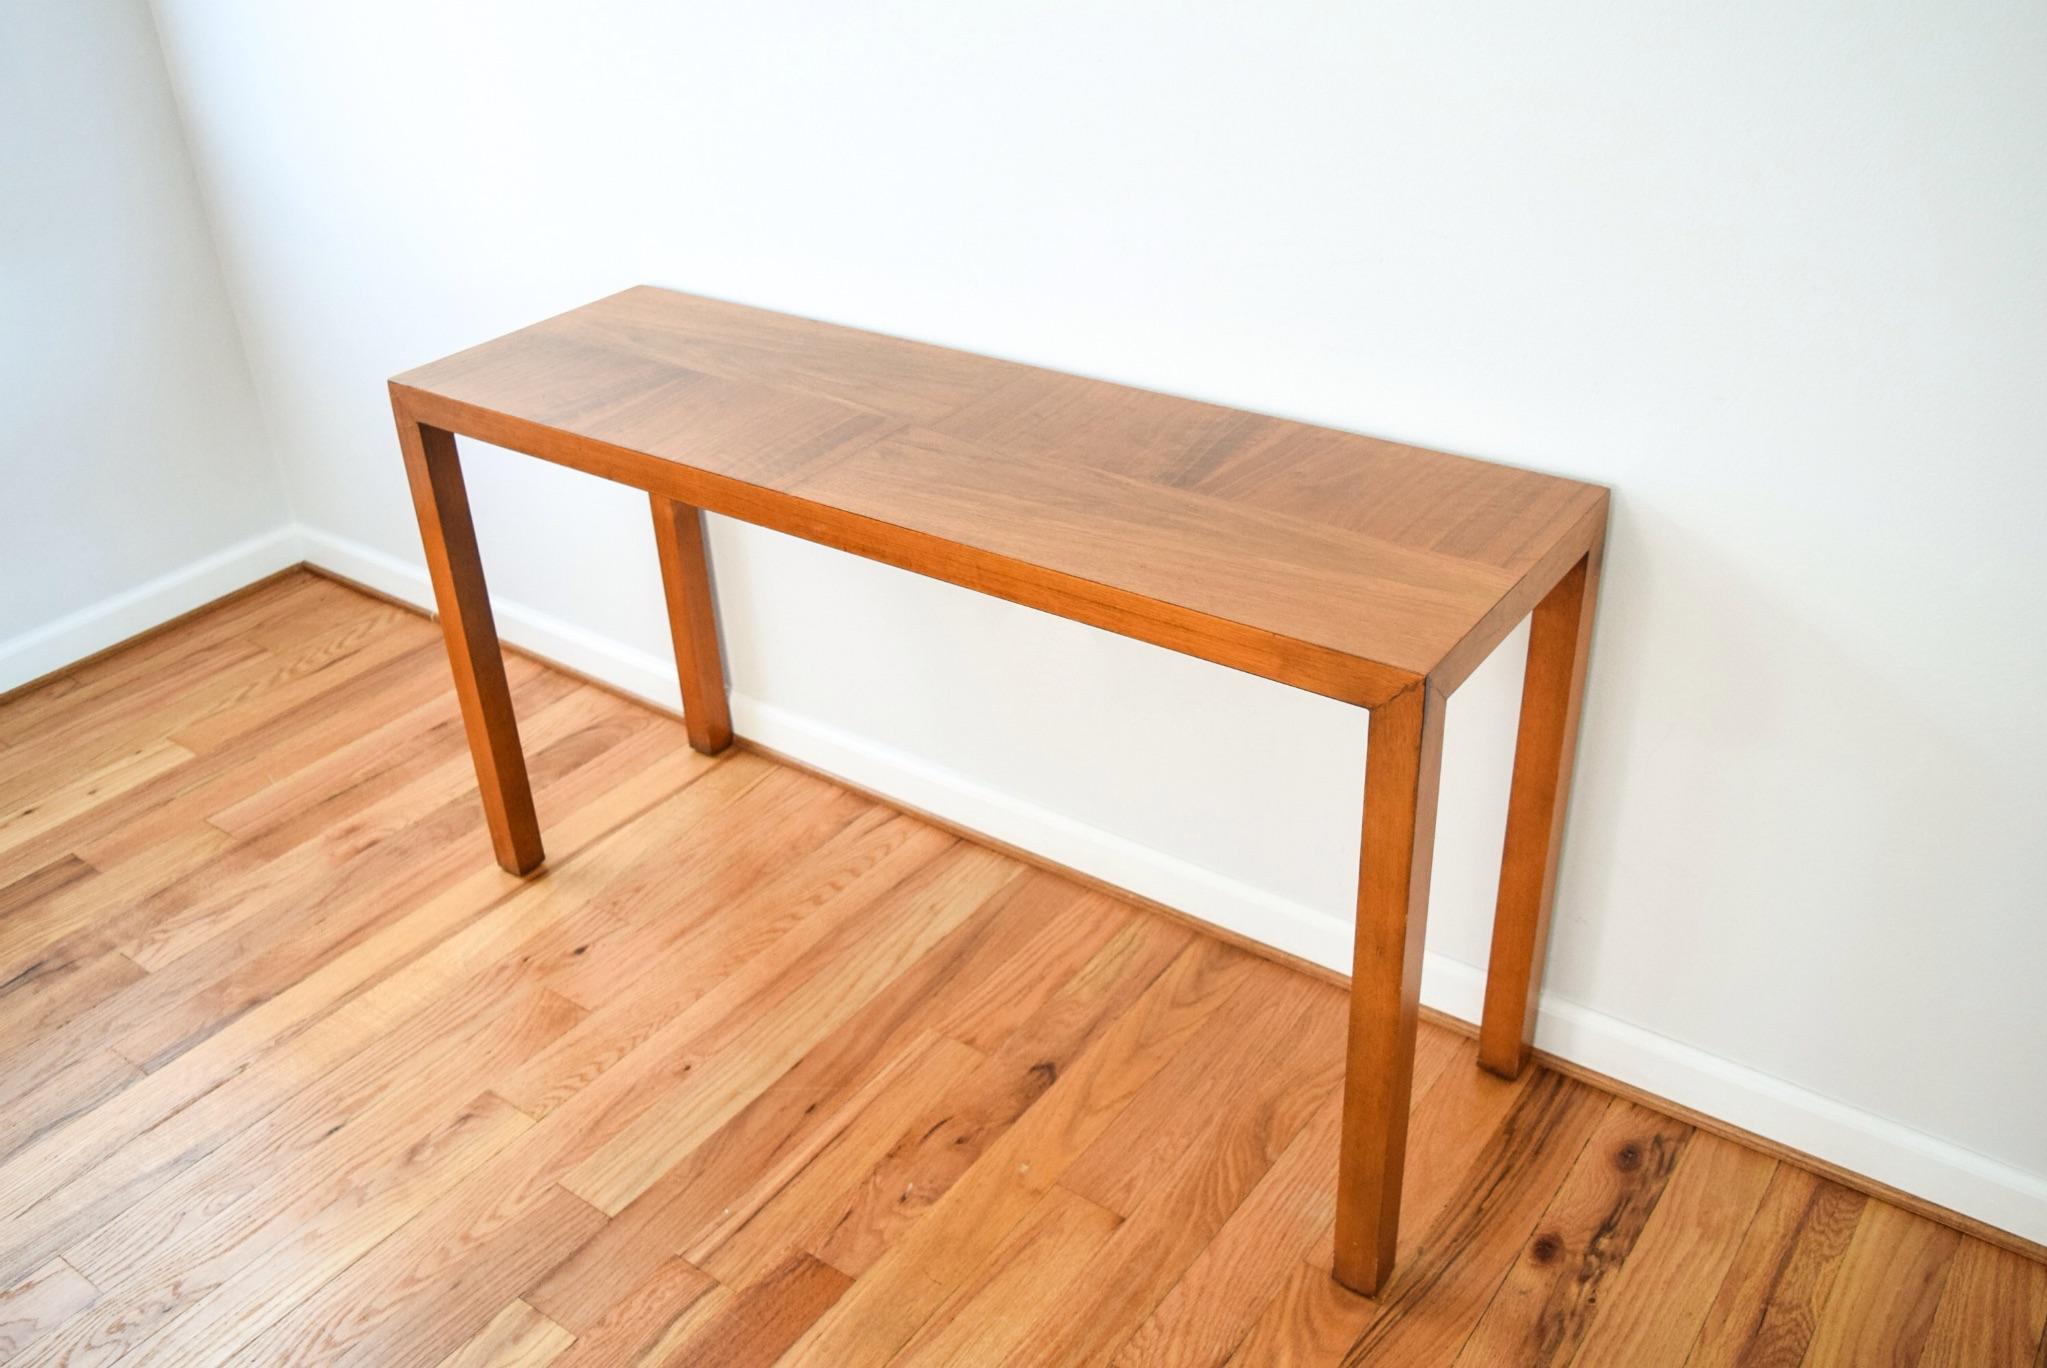 Merveilleux Mid Century Vintage Lane Sofa Console Table   Image 3 Of 9